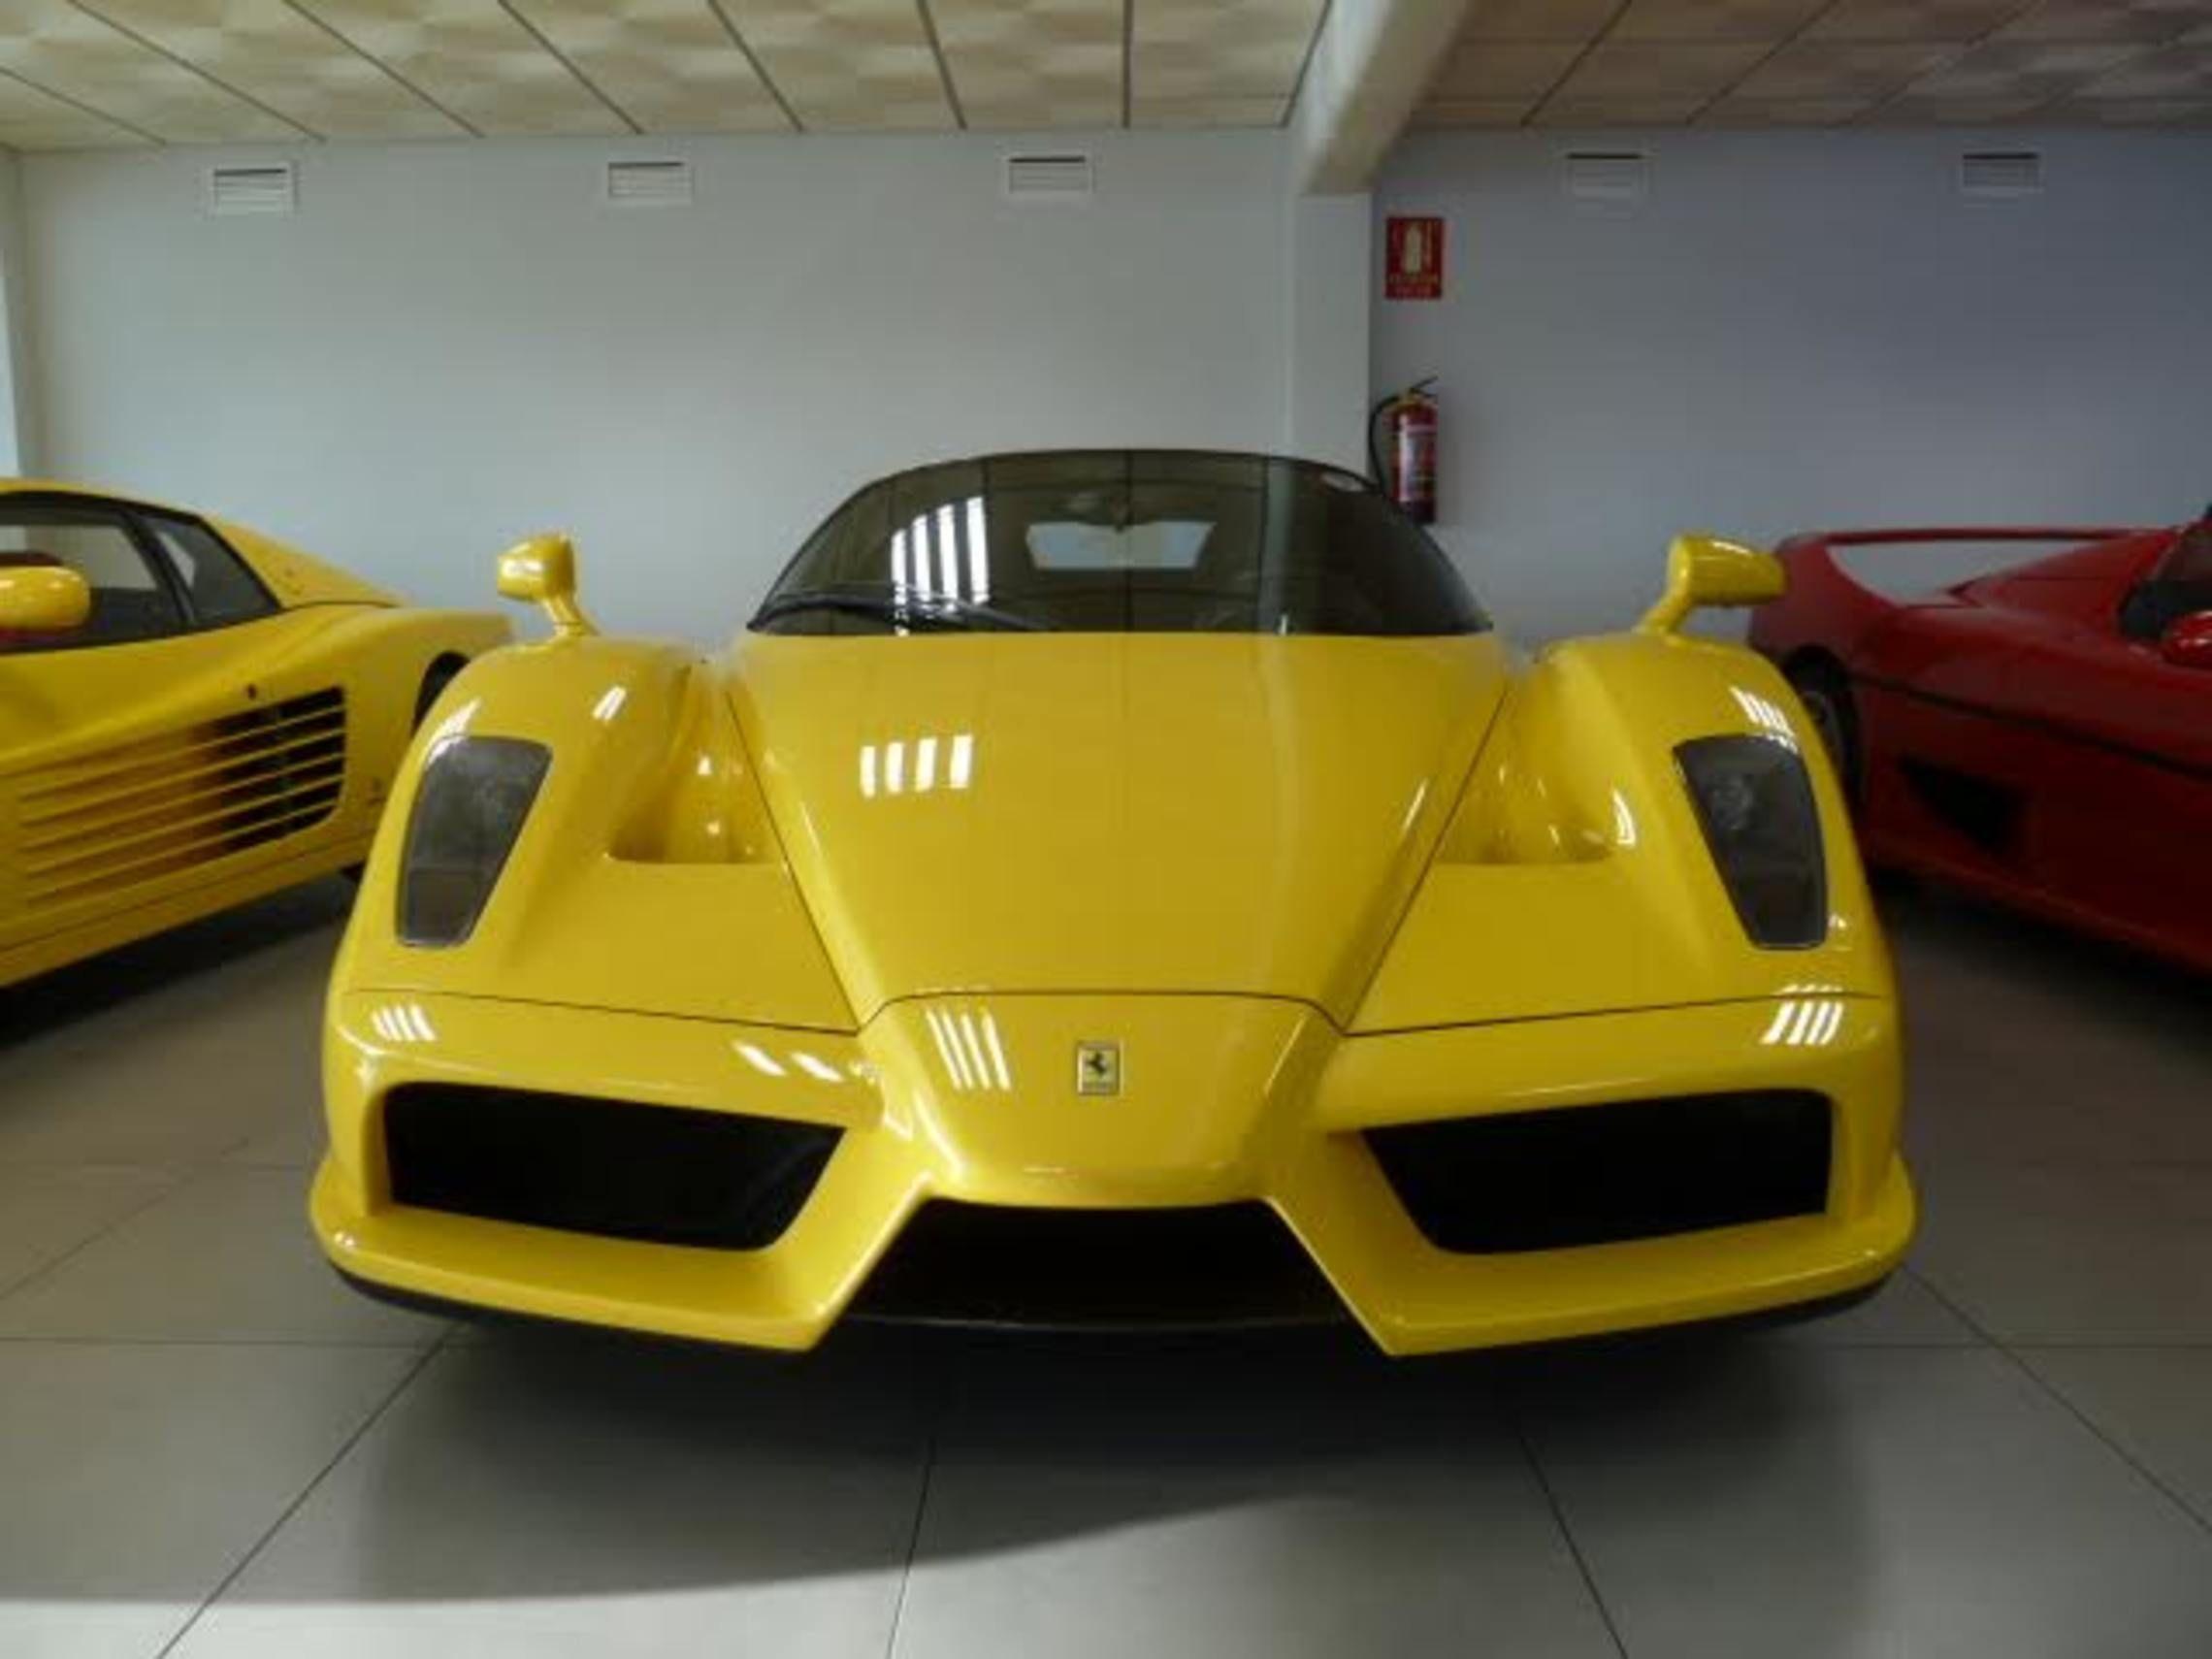 Used luxury car A Fantastic Ferrari Enzo in Yellow, Registered 02 ...